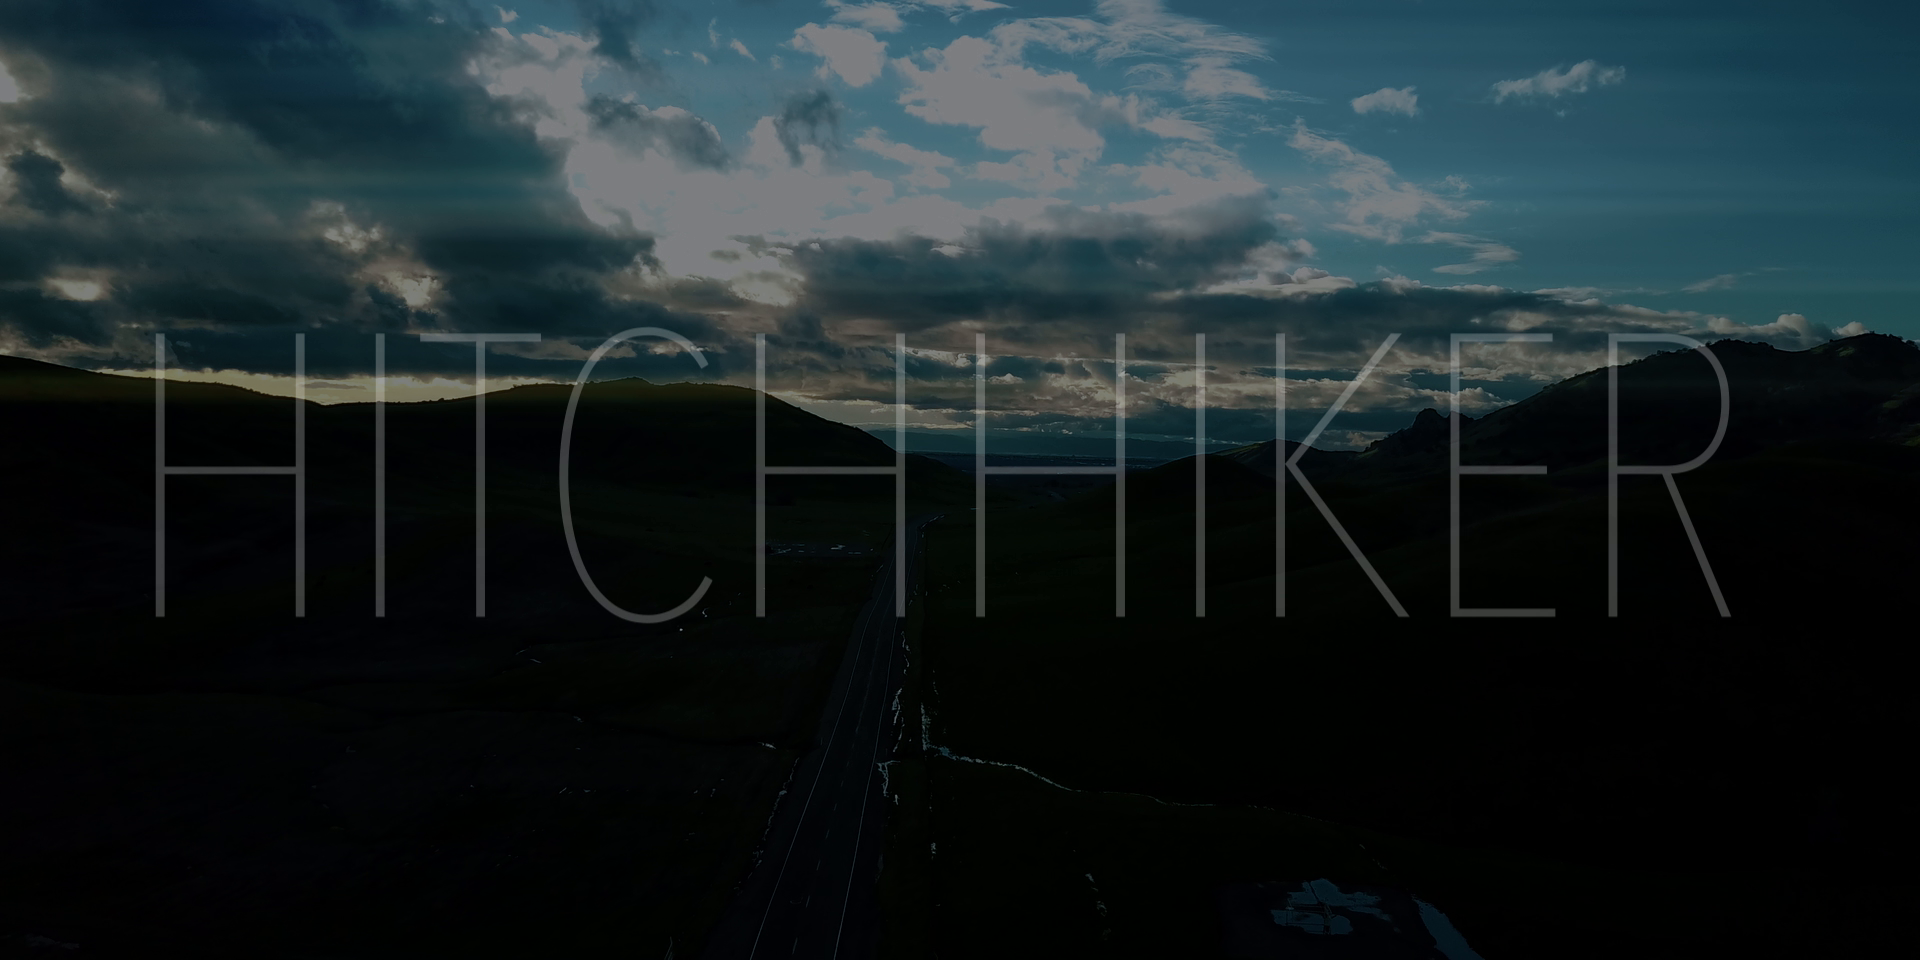 HITCHHIKER Teaser Trailer